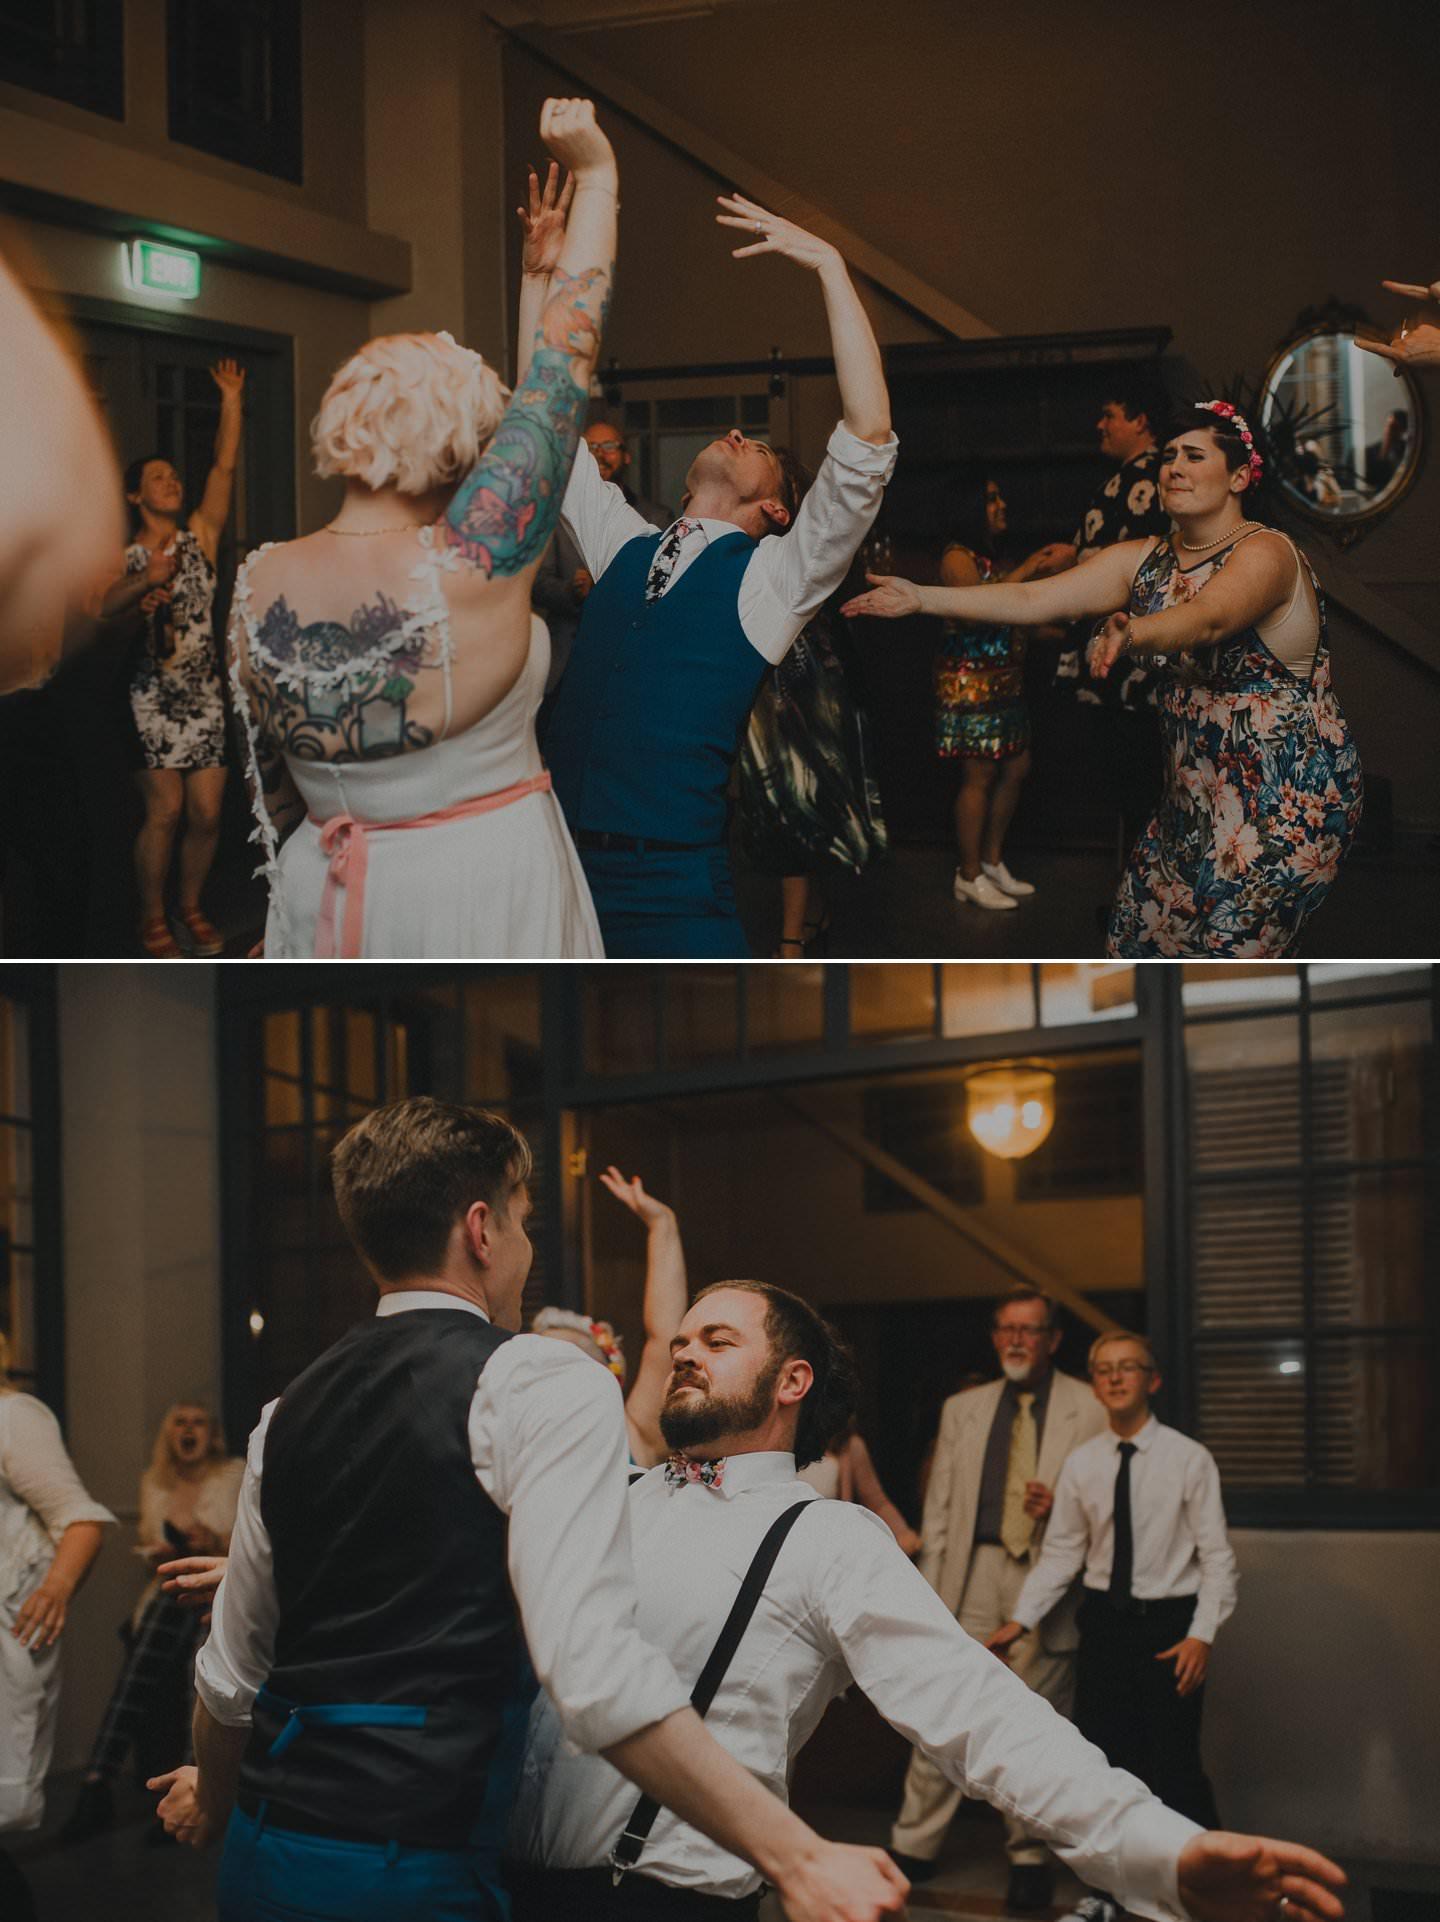 Wedding dance floor photos